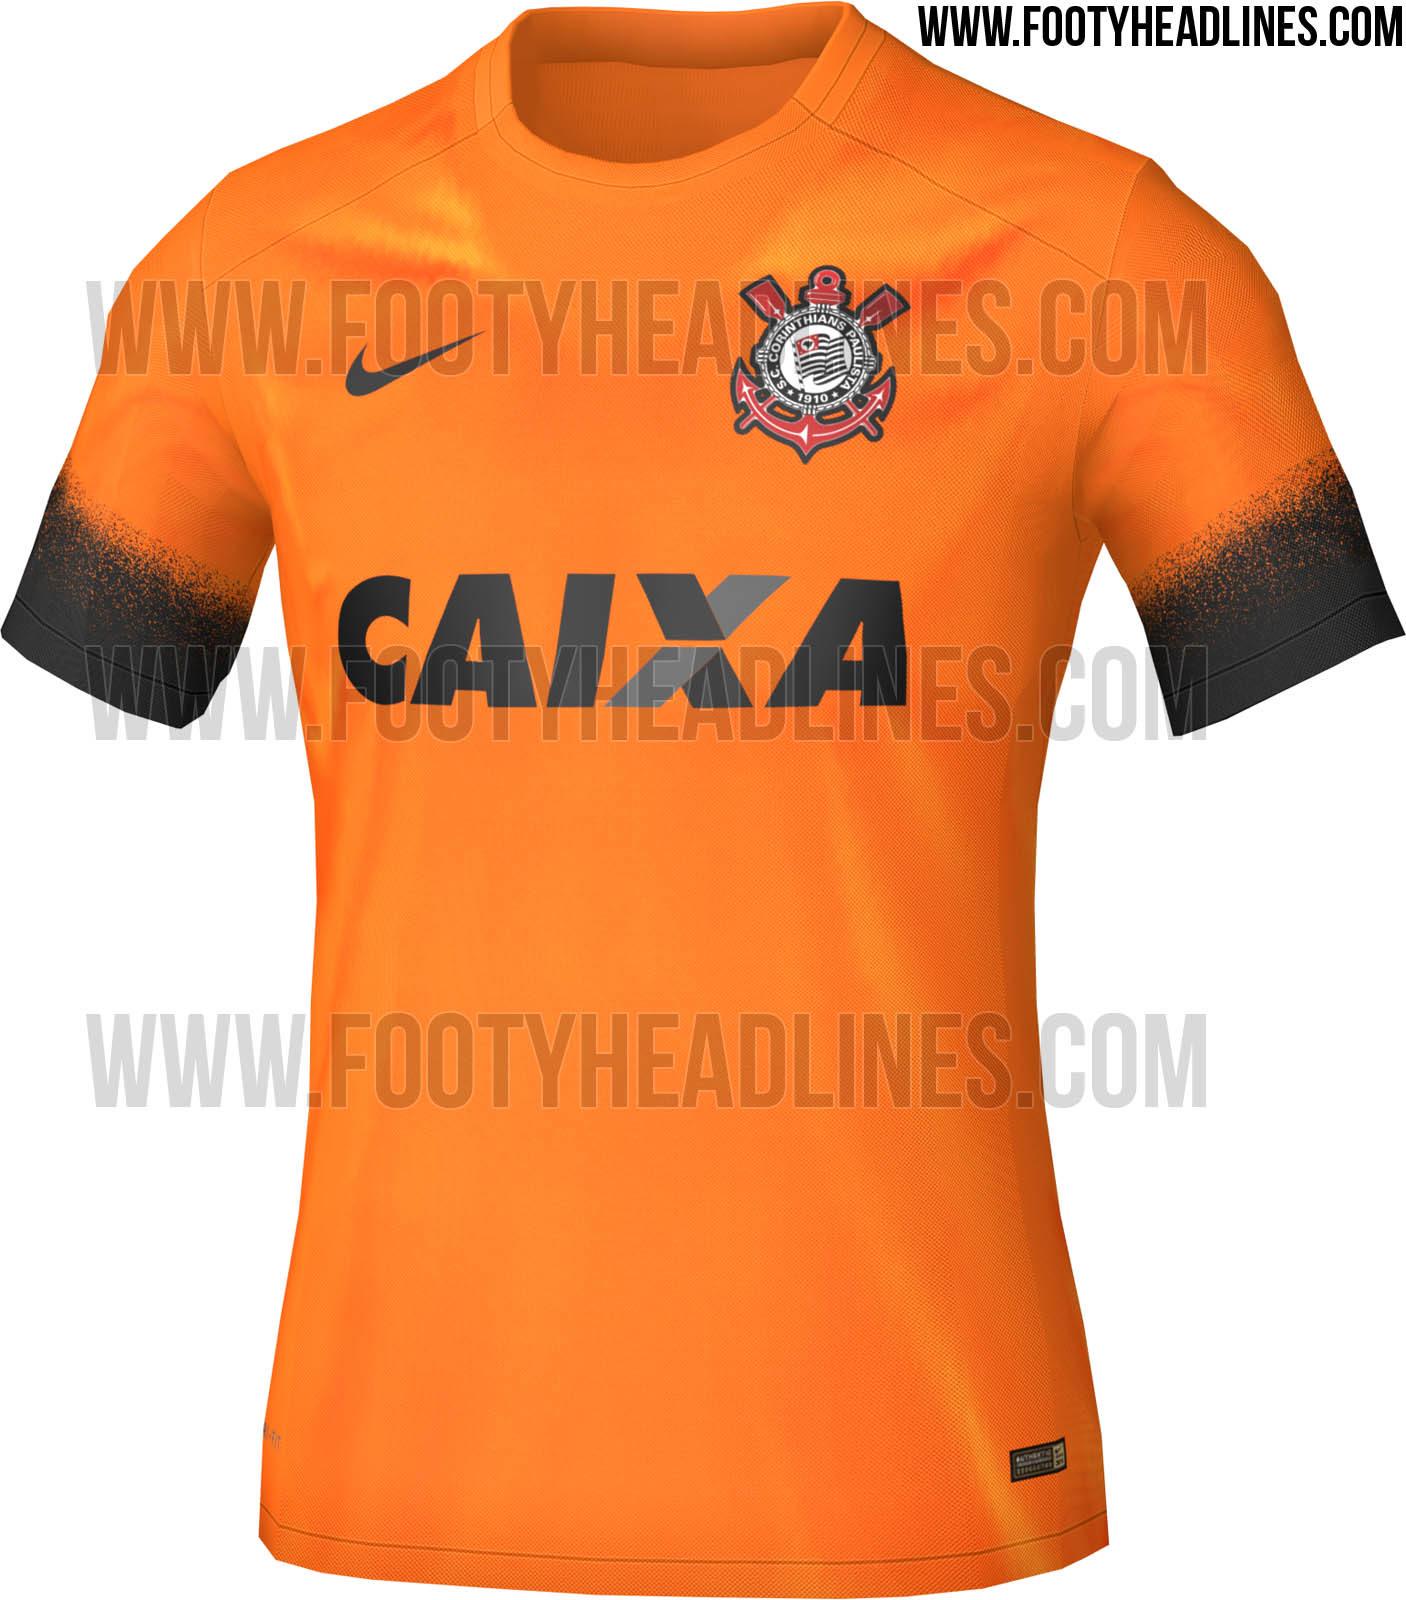 2324adfd26 Loja vaza novo terceiro uniforme laranja do Corinthians - Lance - R7 Futebol